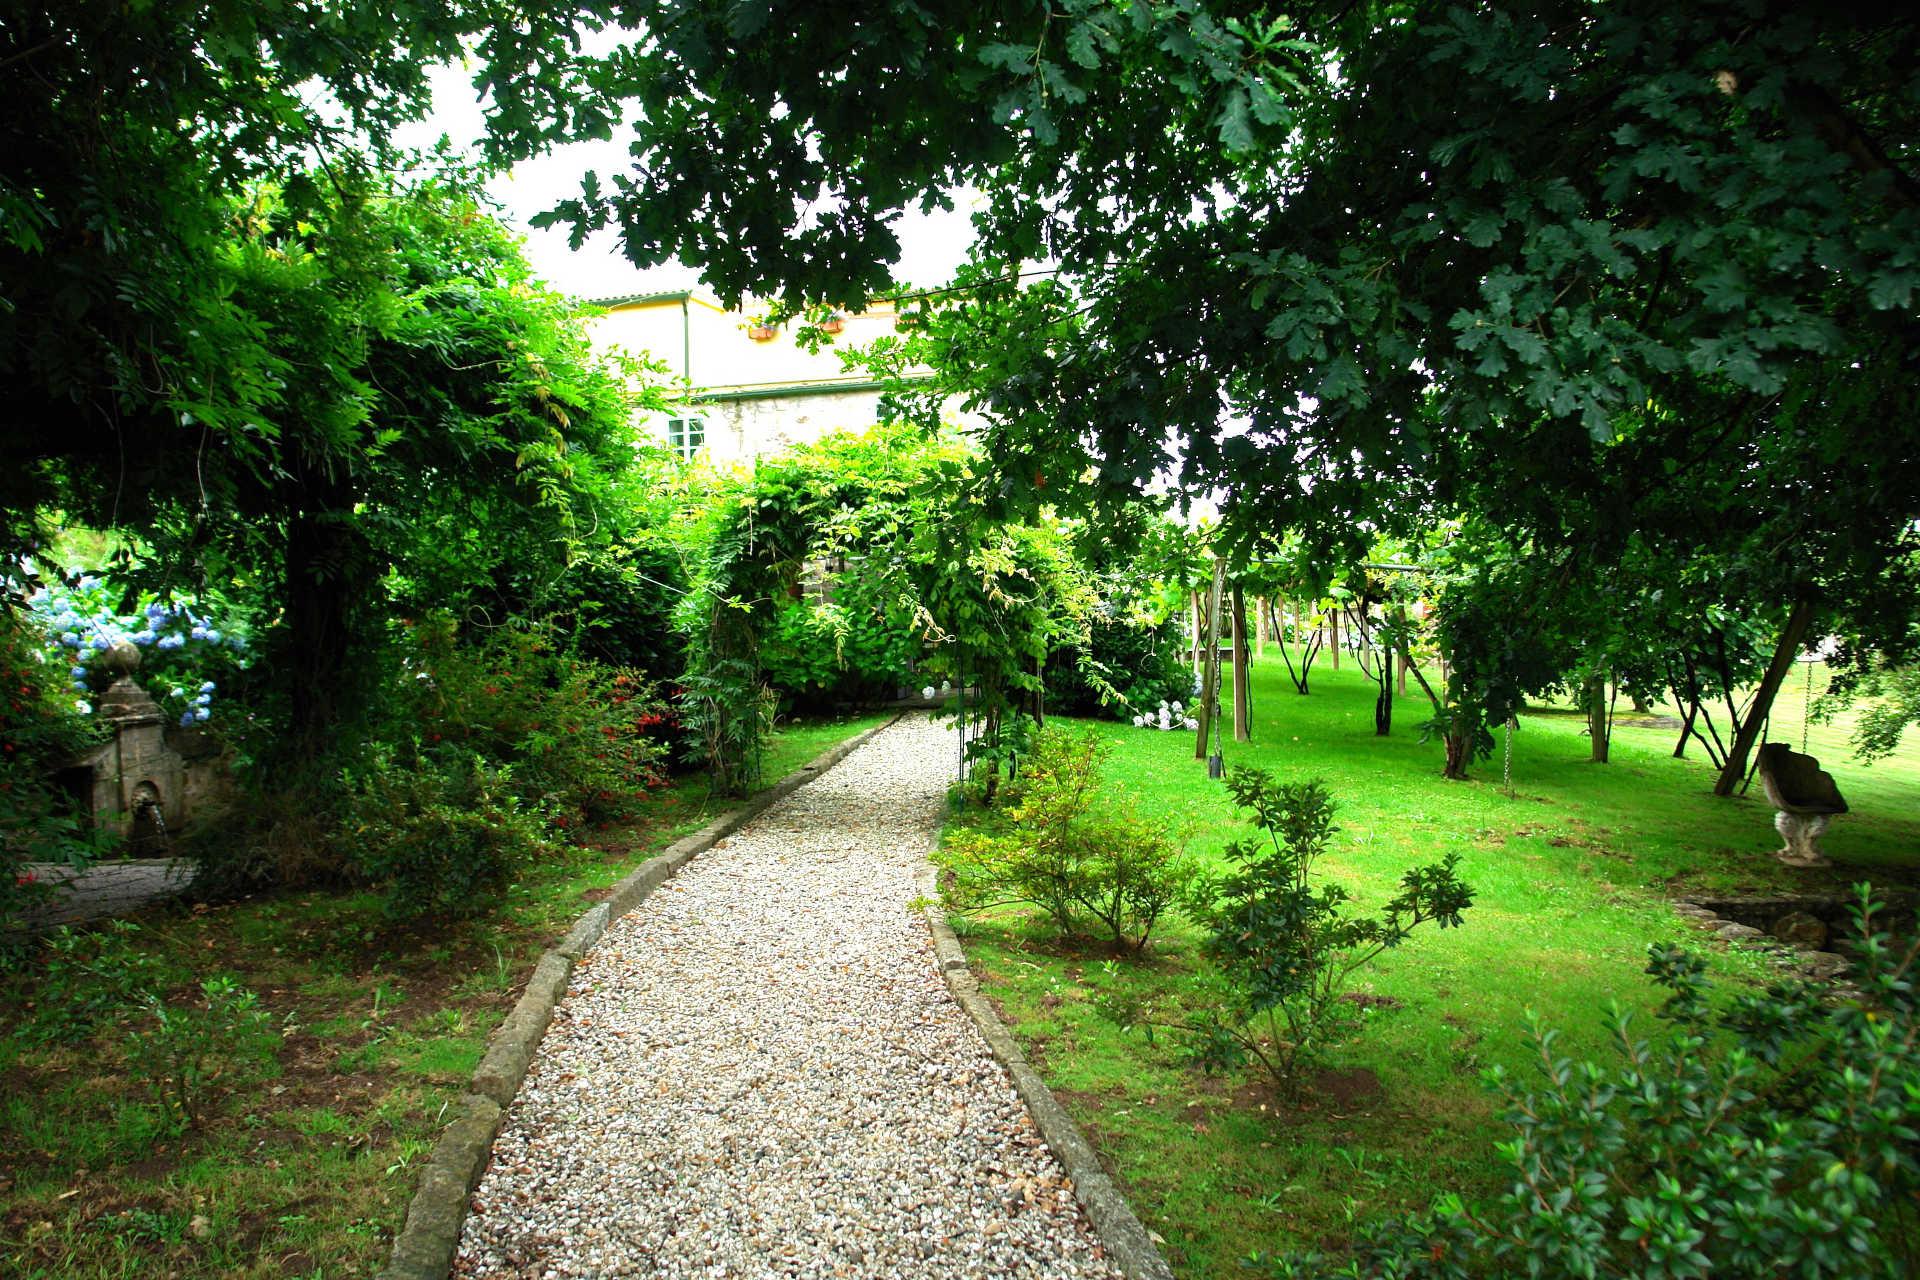 Jardines exteriores camino trasero casa rural as seis chemineas